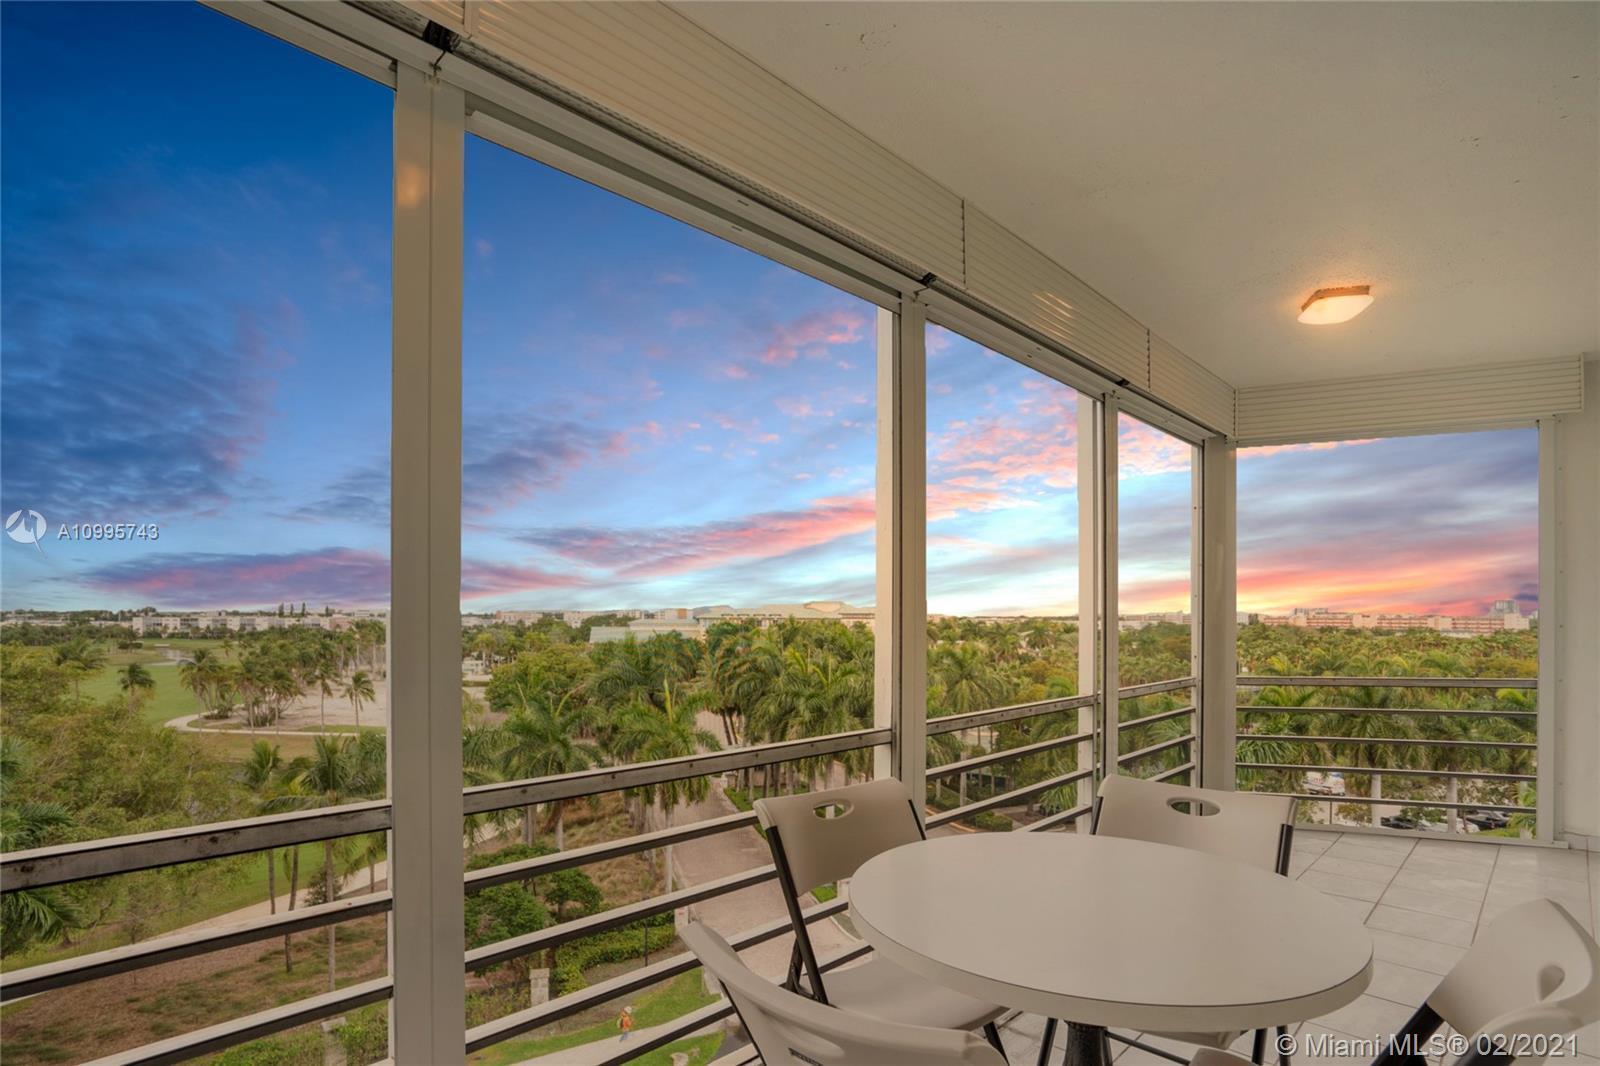 Beautiful and spacious 2b/2b unit at Fairways Rivera Condo. Unobstructed views of The Diplomat Golf